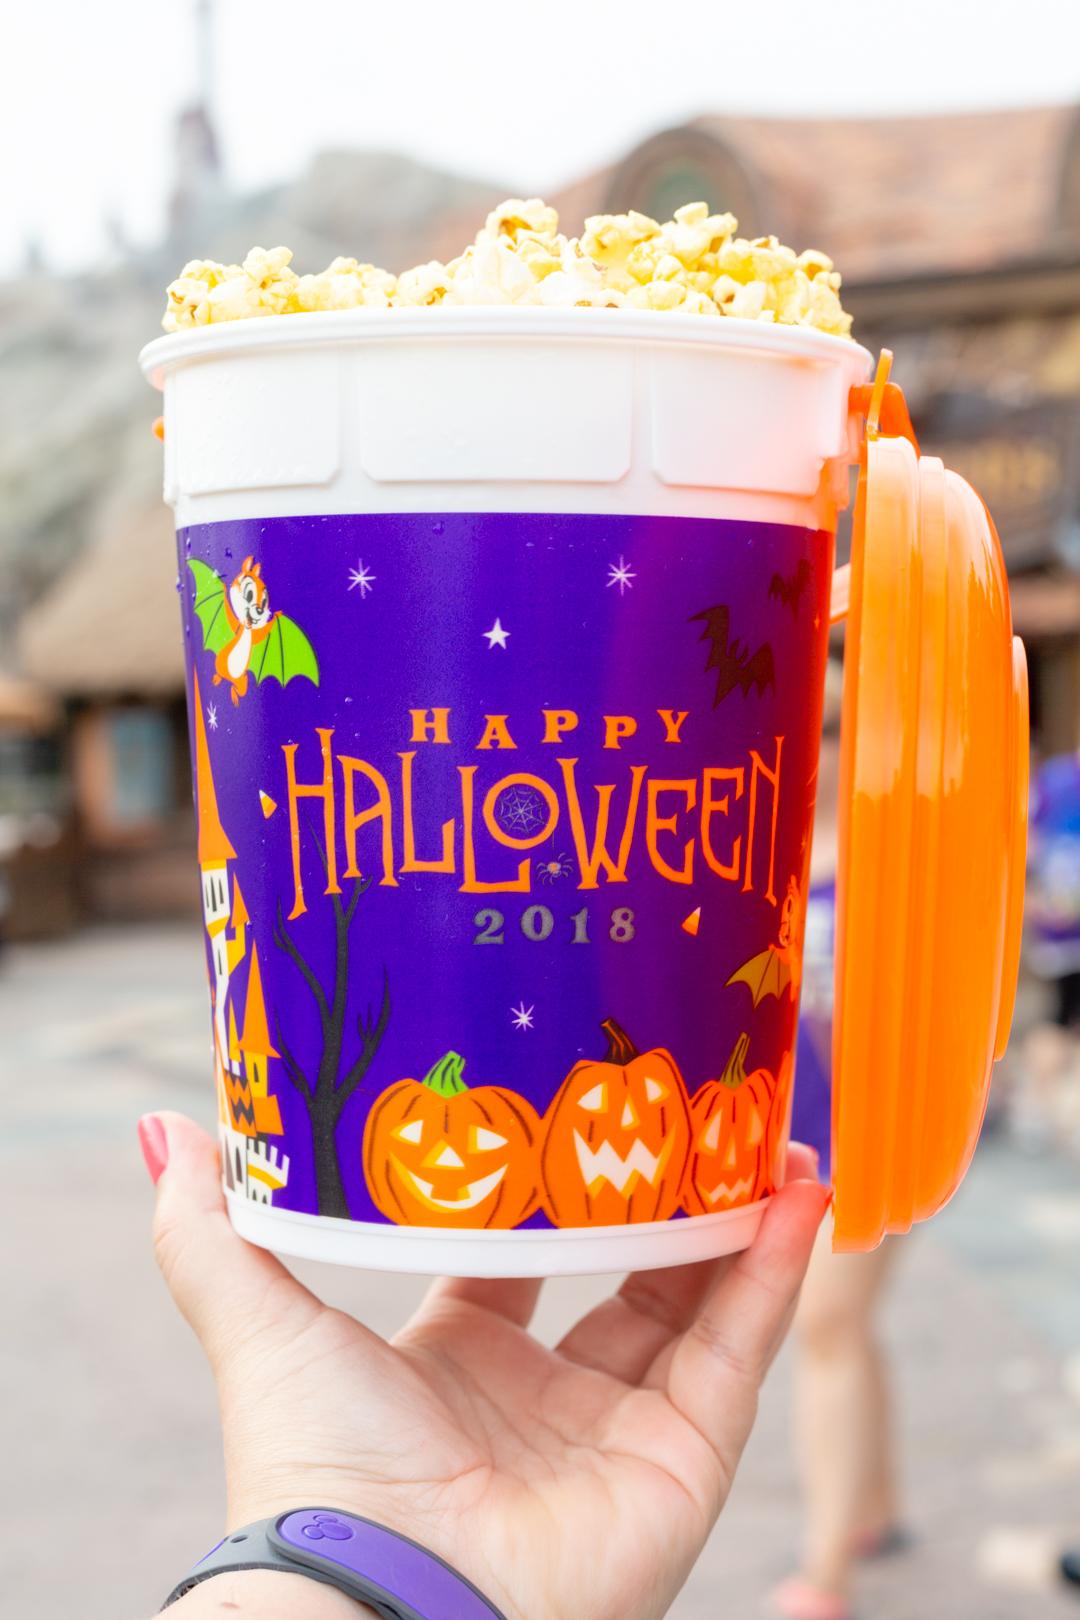 Collectible Popcorn Tub Disney 2018